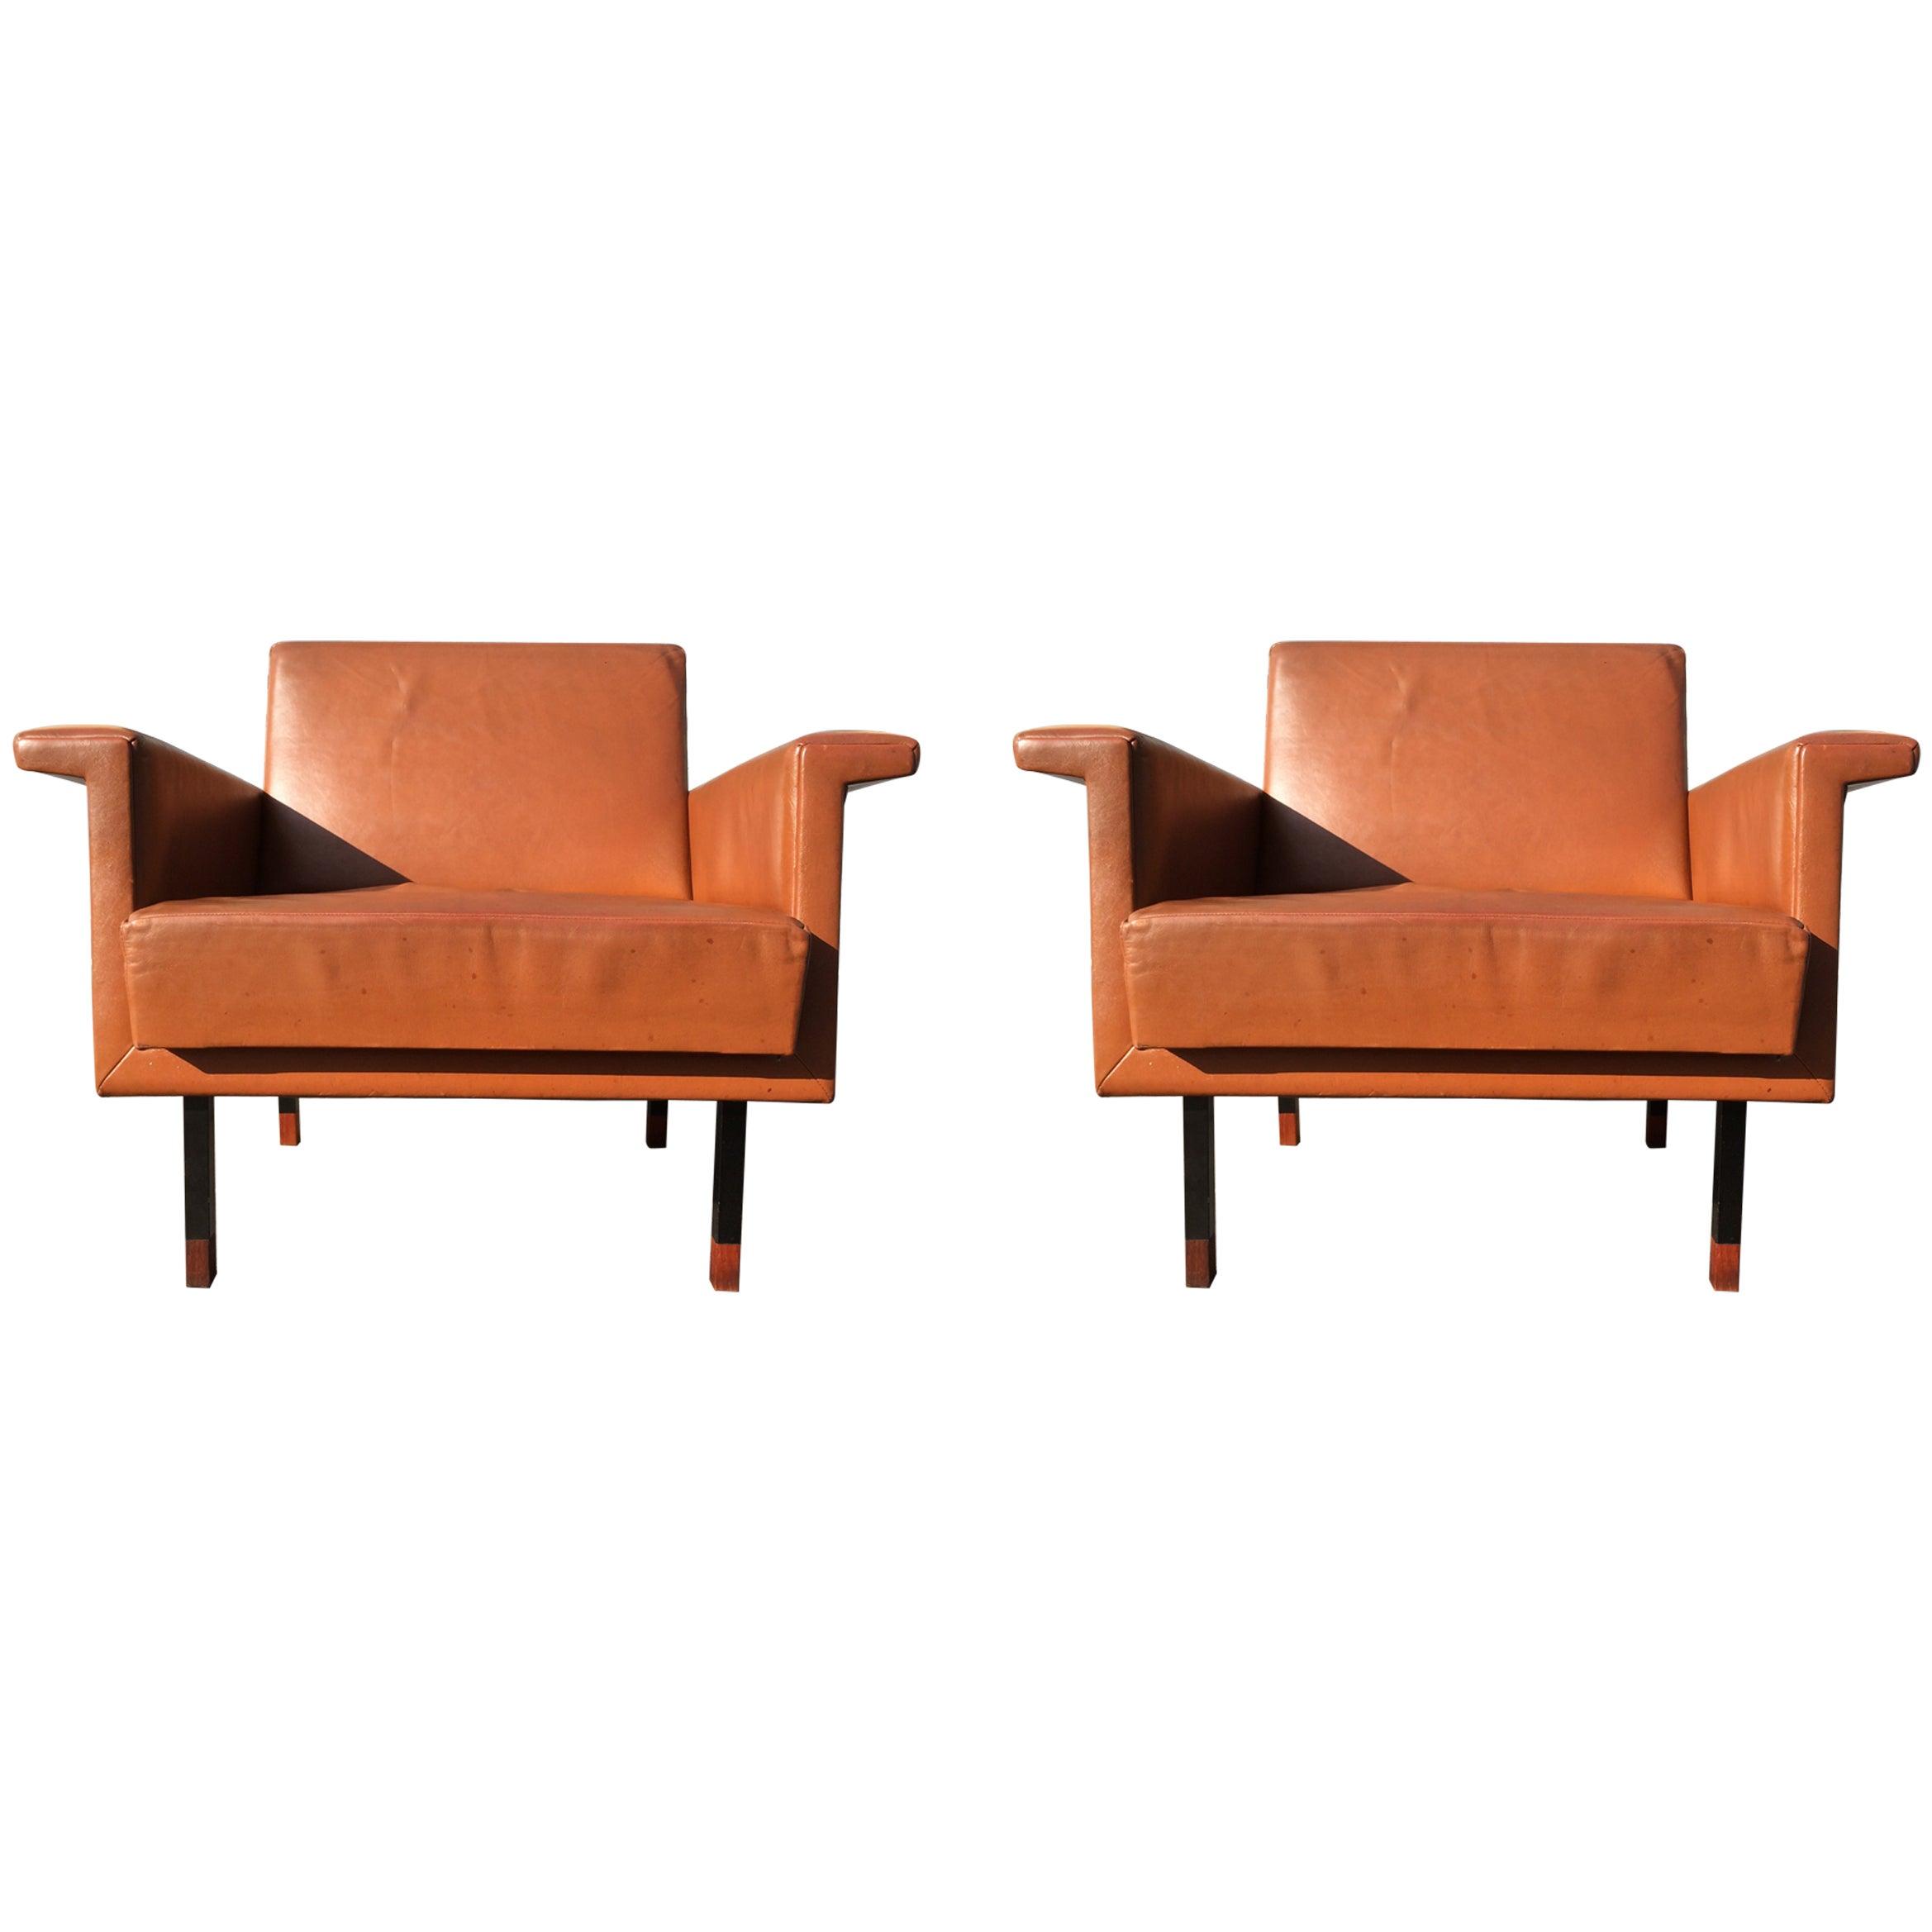 Pair of Eugen Schmidt Soloform Lounge Chairs, Cognac Leather